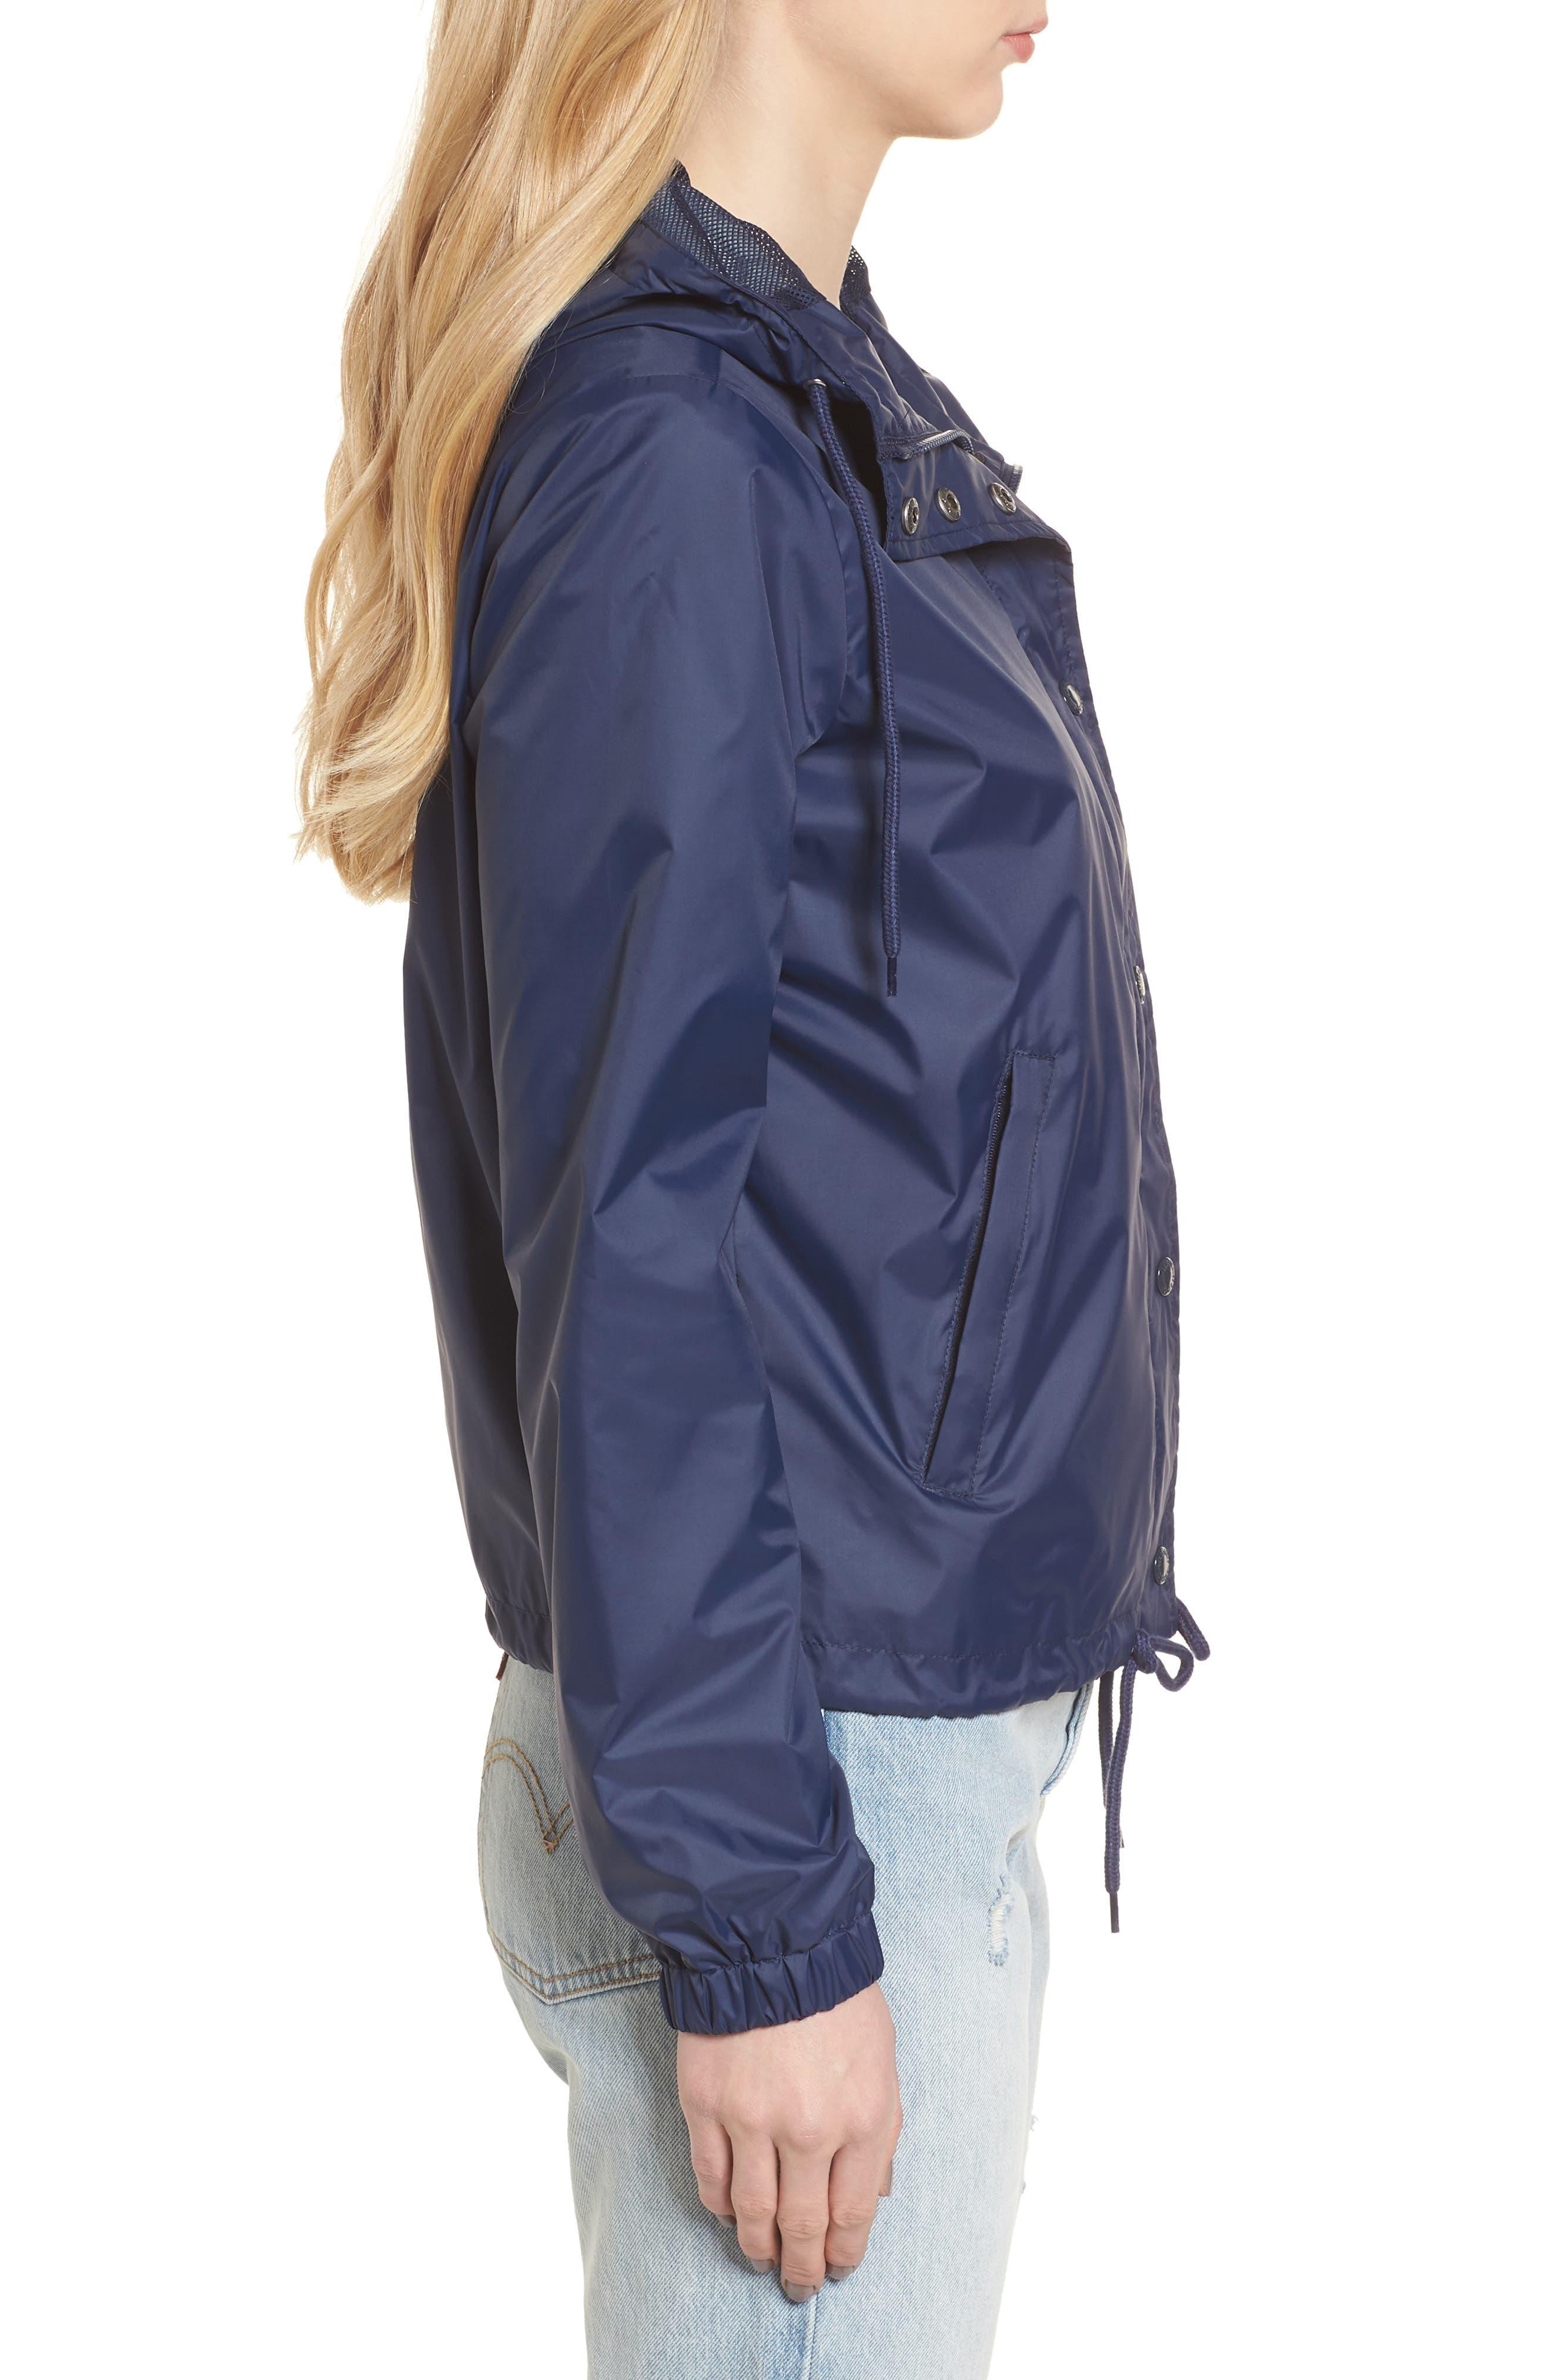 Retro Hooded Coach's Jacket,                             Alternate thumbnail 3, color,                             Navy